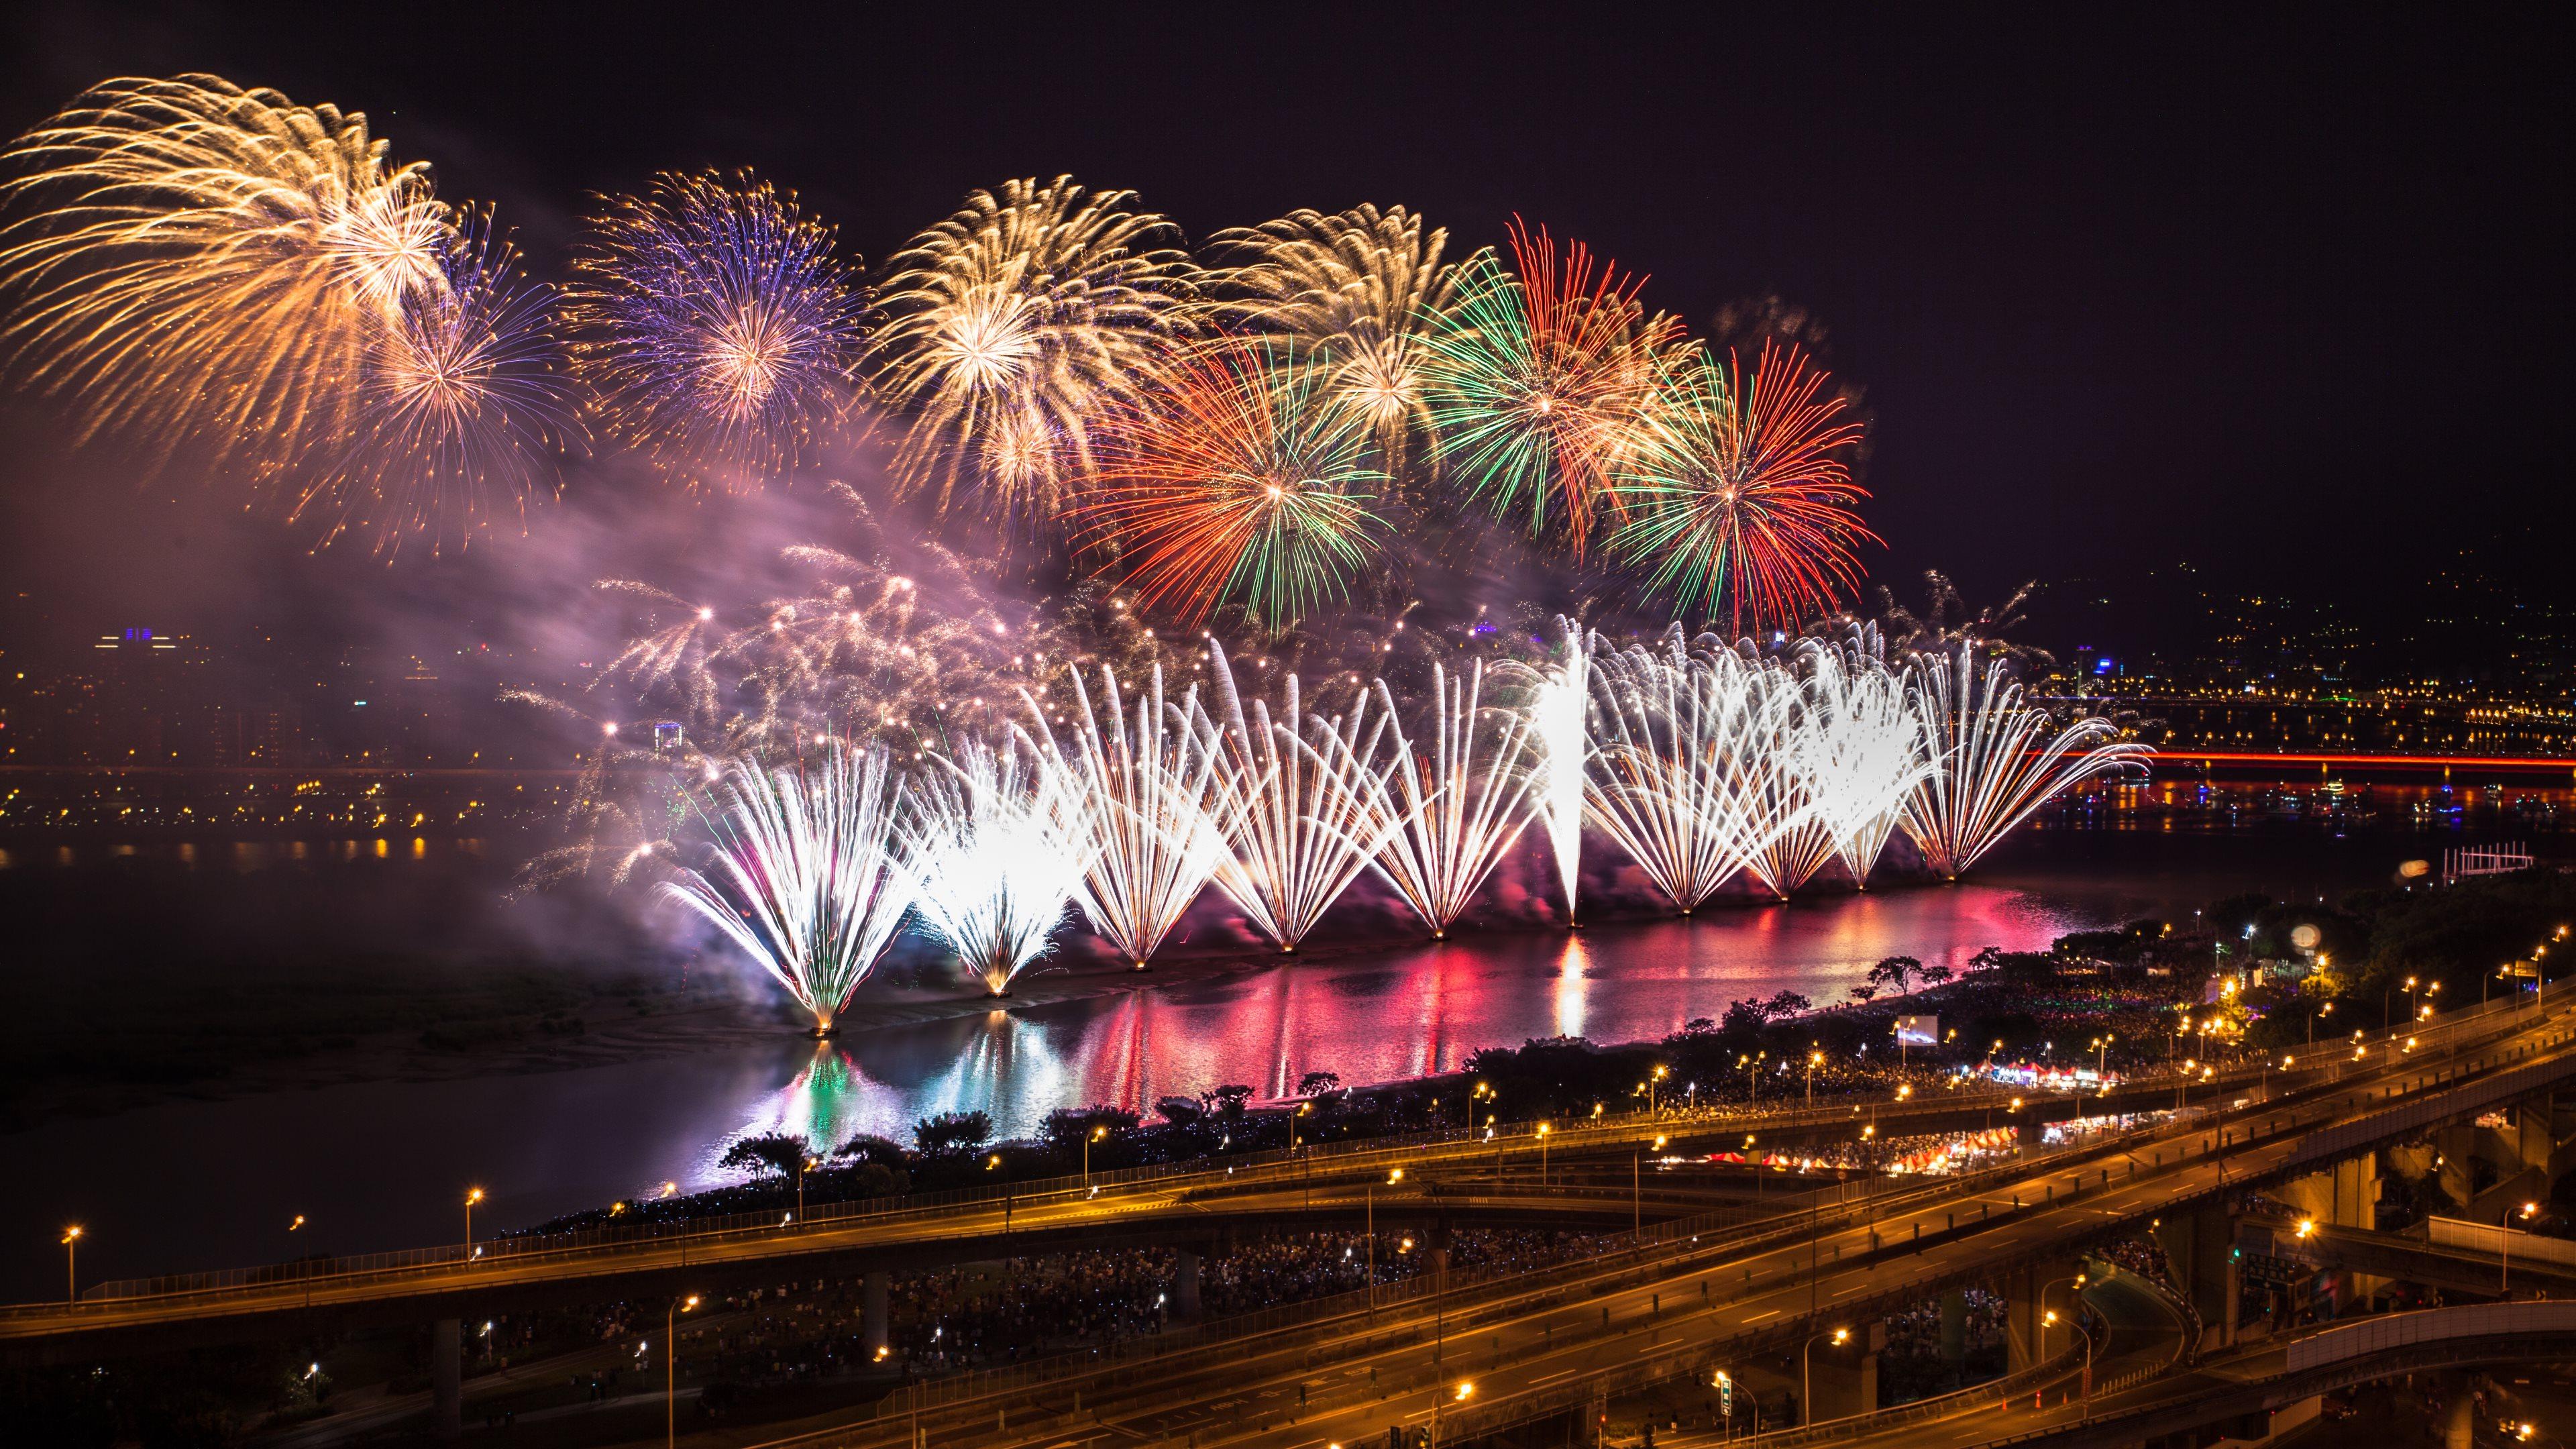 Fireworks Wallpaper Free